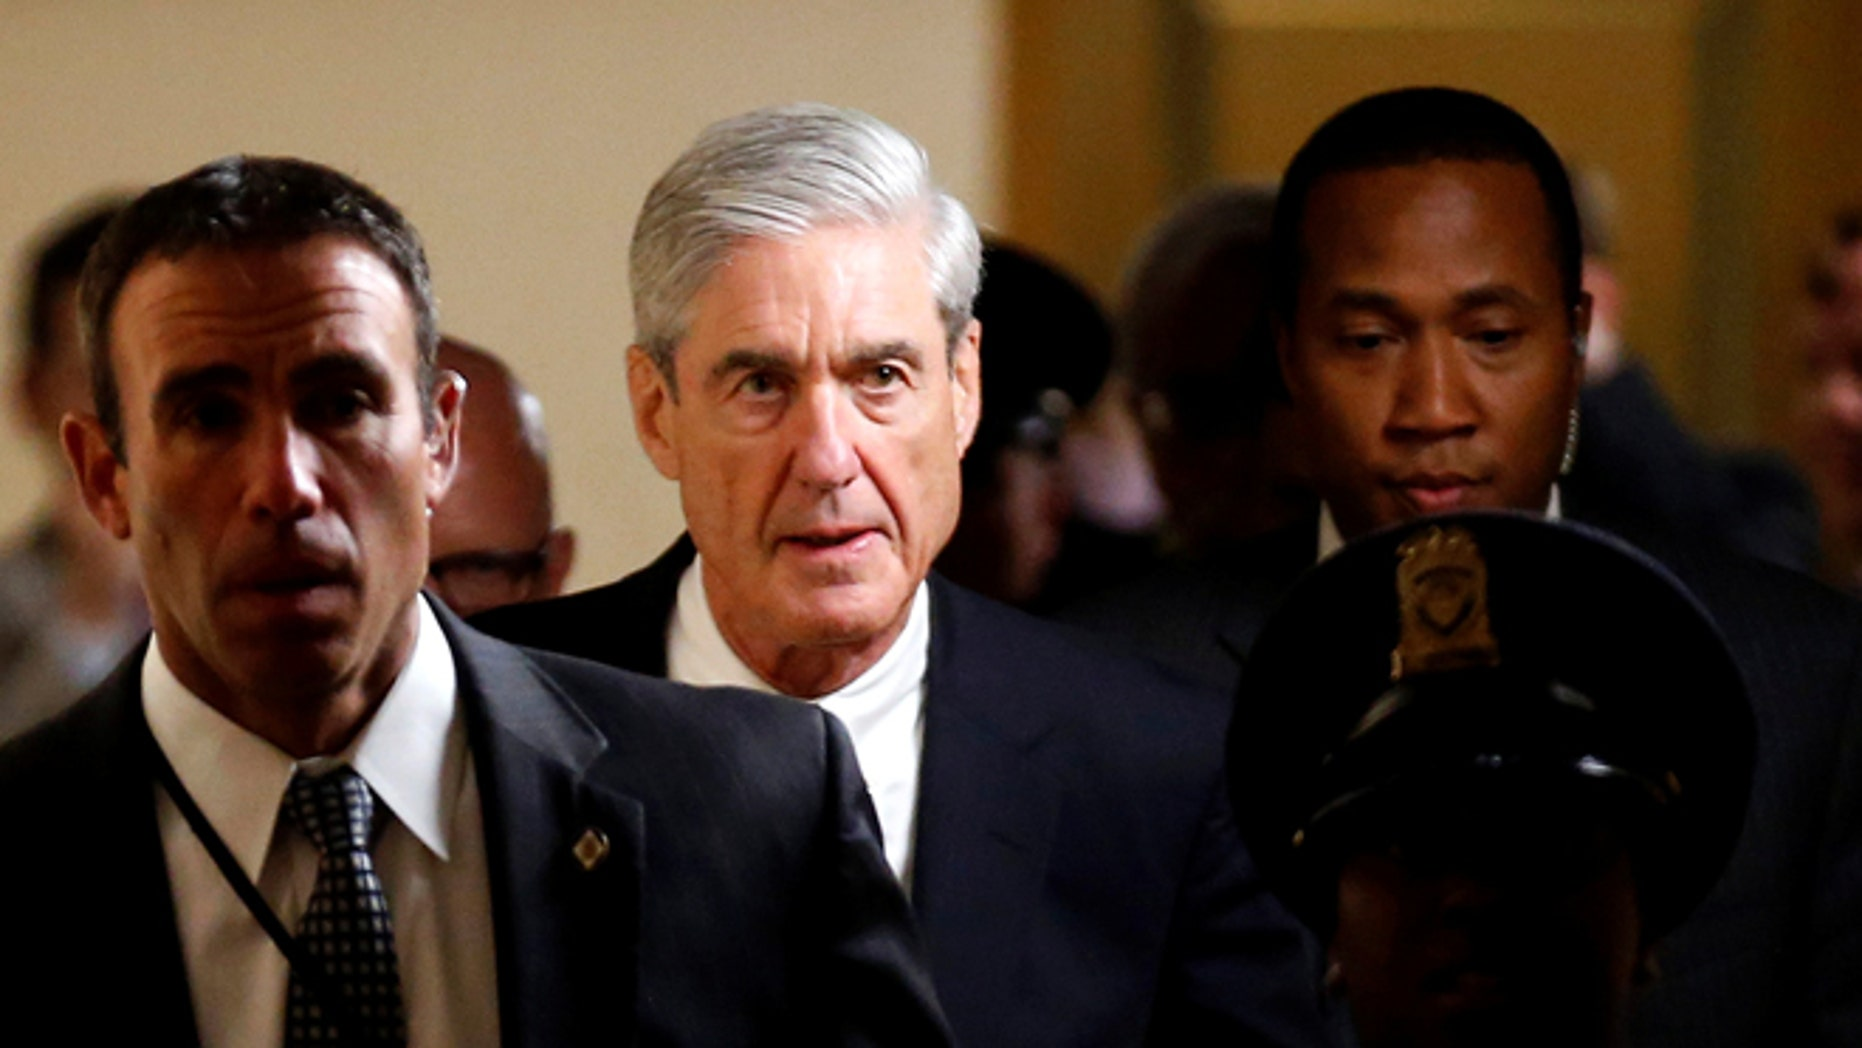 Robert Mueller's investigators subpoenaed more than a dozen Trump campaign officials requesting Russia-related documents last month.